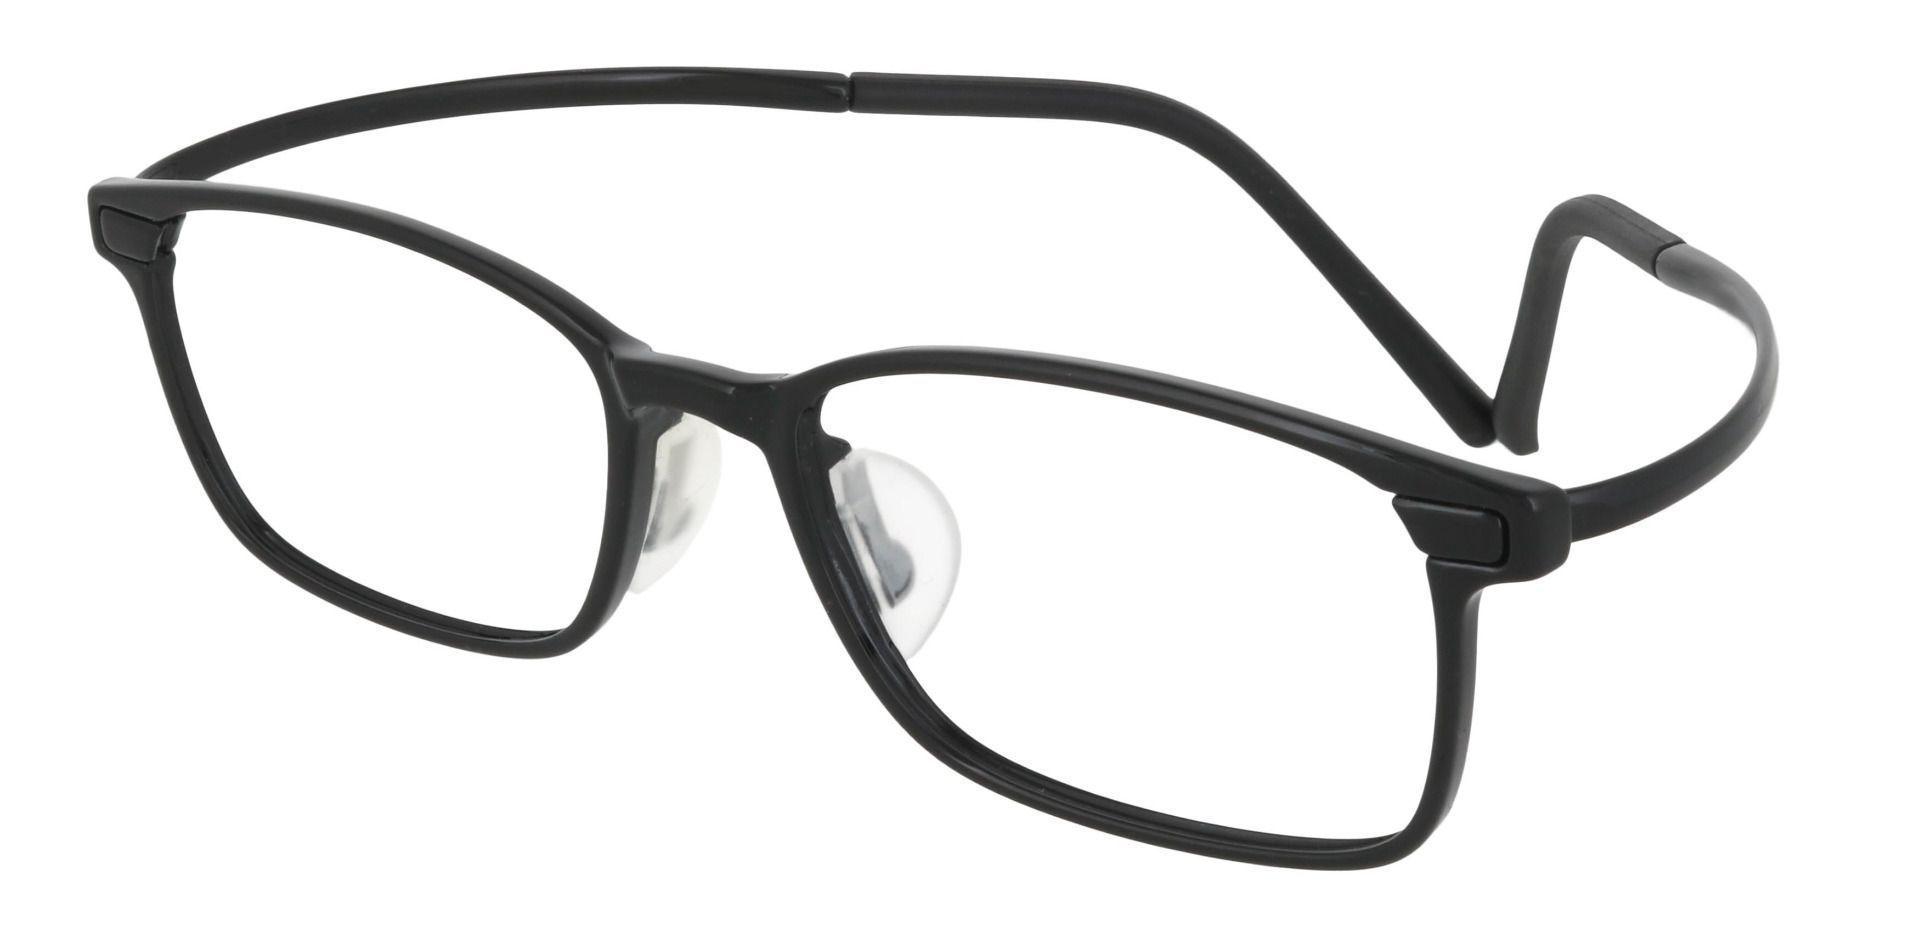 Weaver Rectangle Prescription Glasses - Black